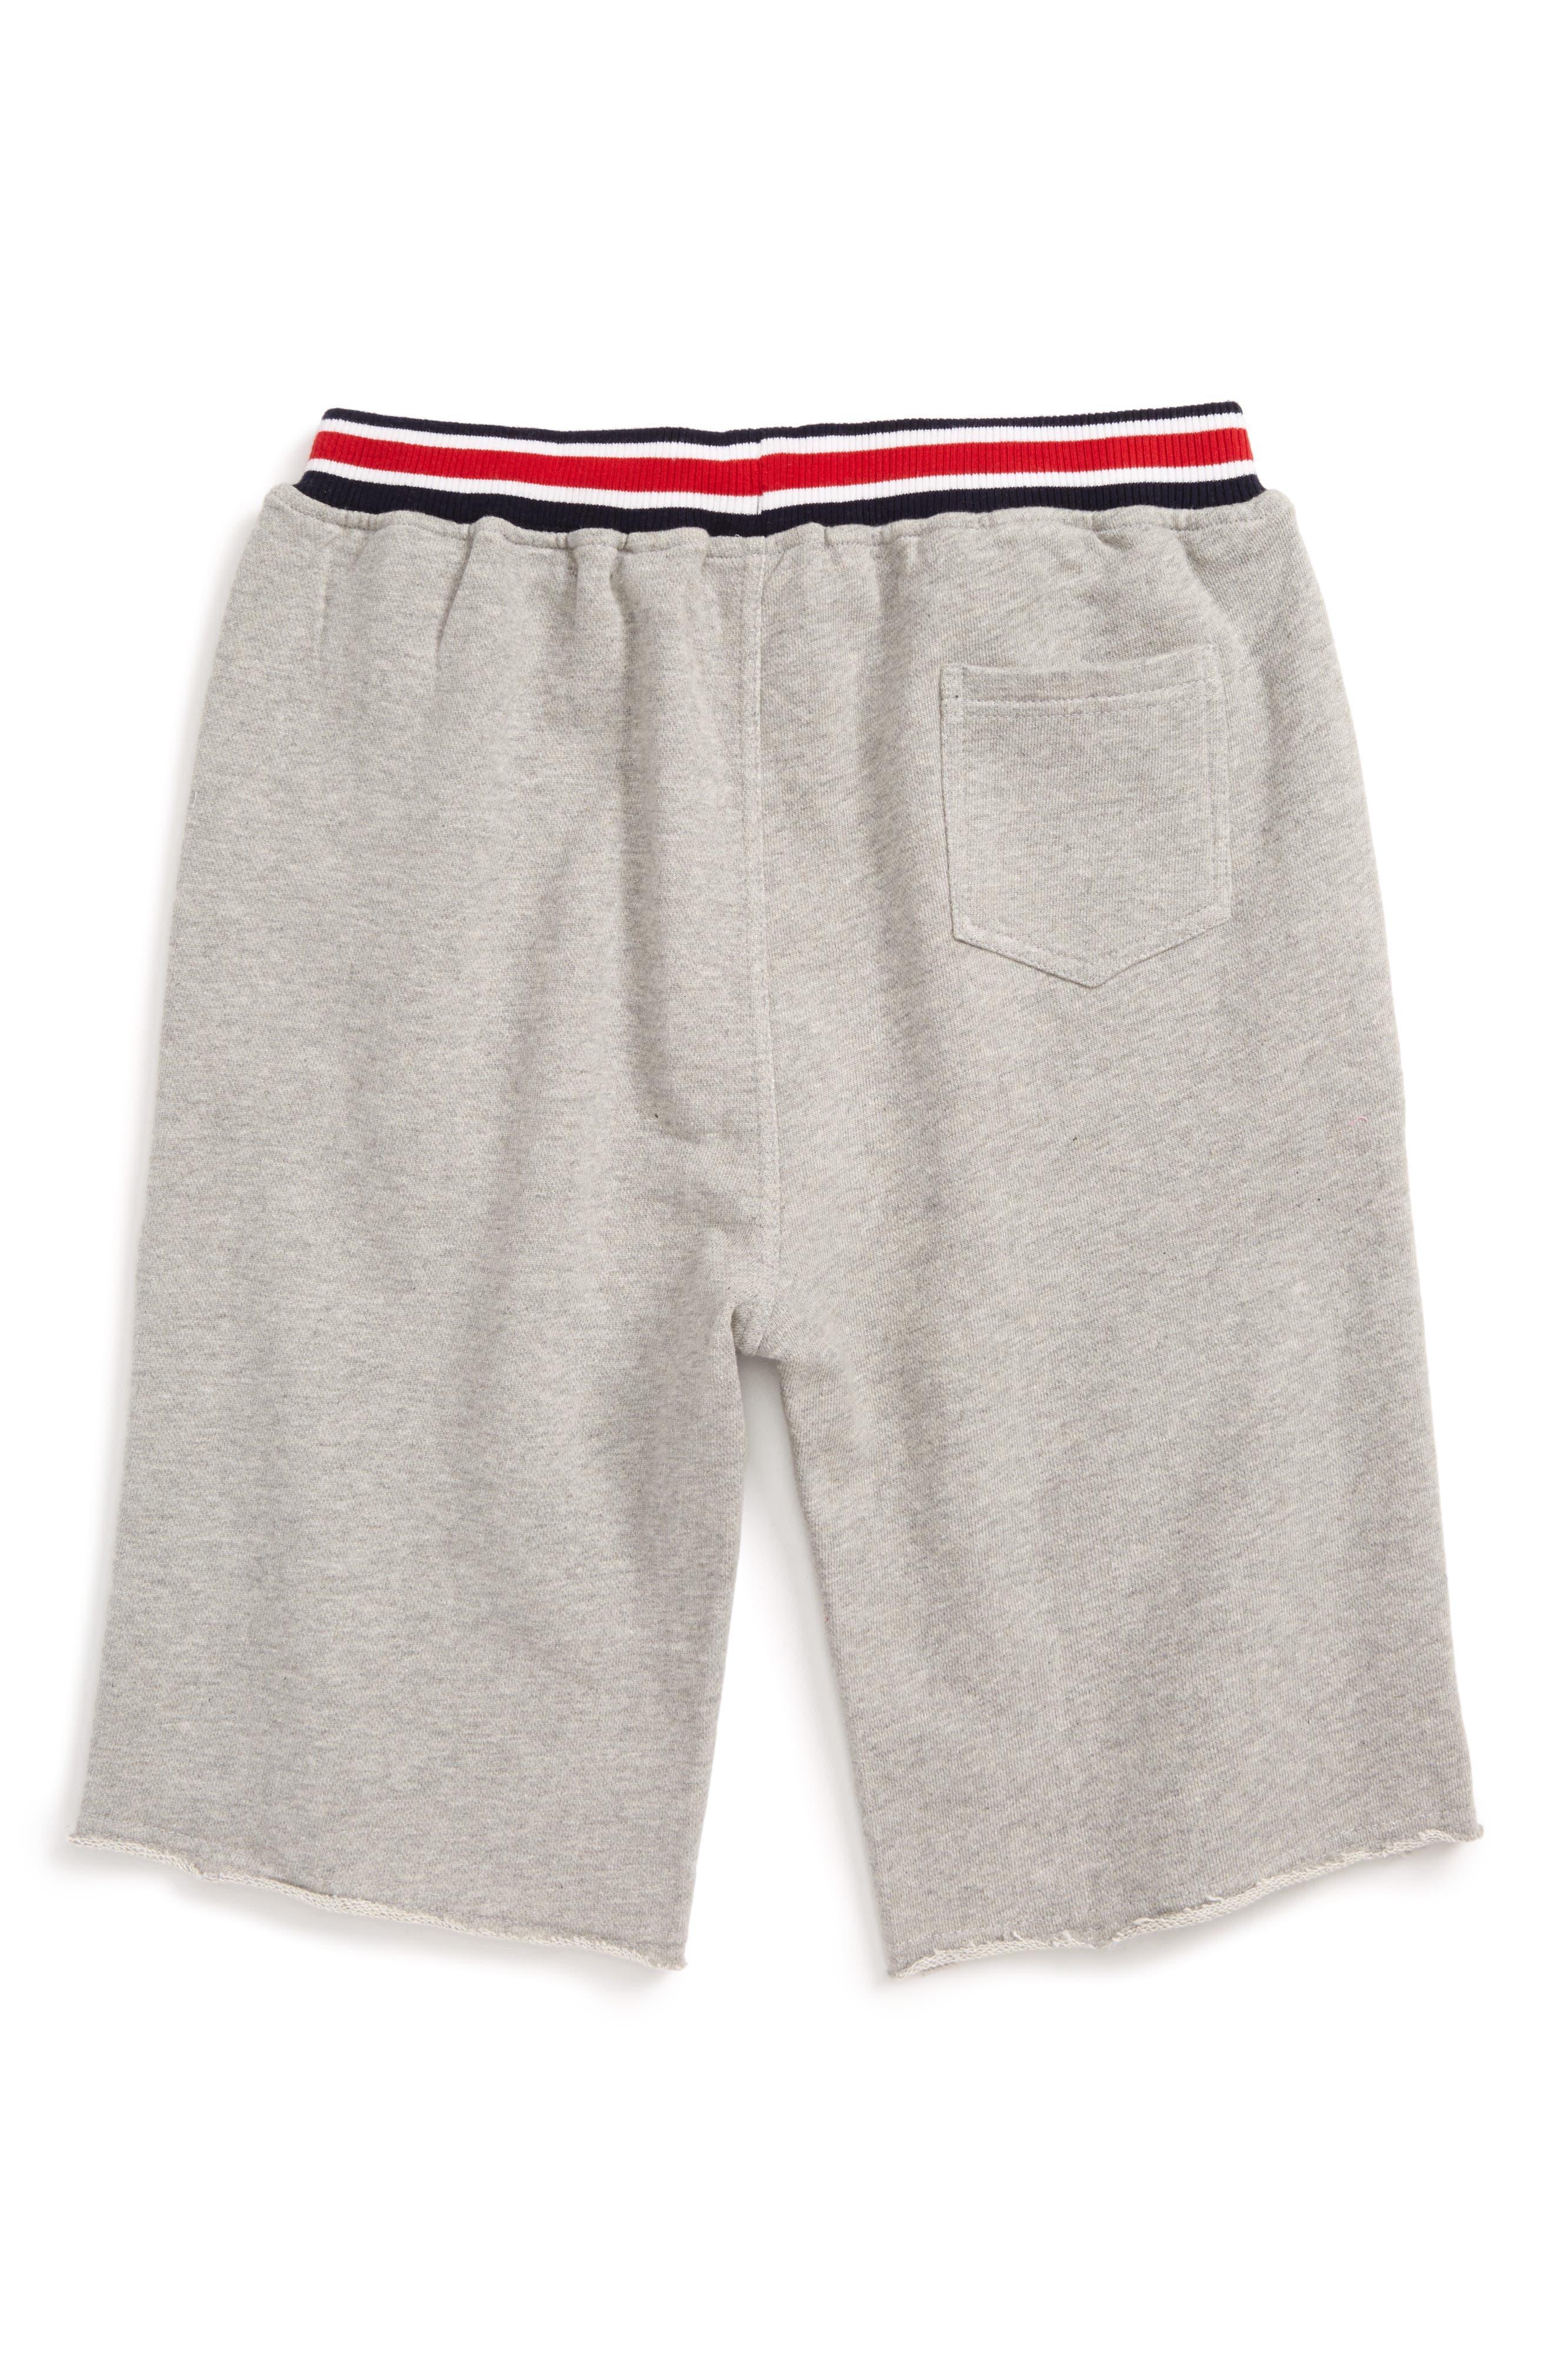 Alternate Image 2  - Peek Varsity Knit Shorts (Toddler Boys, Little Boys & Big Boys)